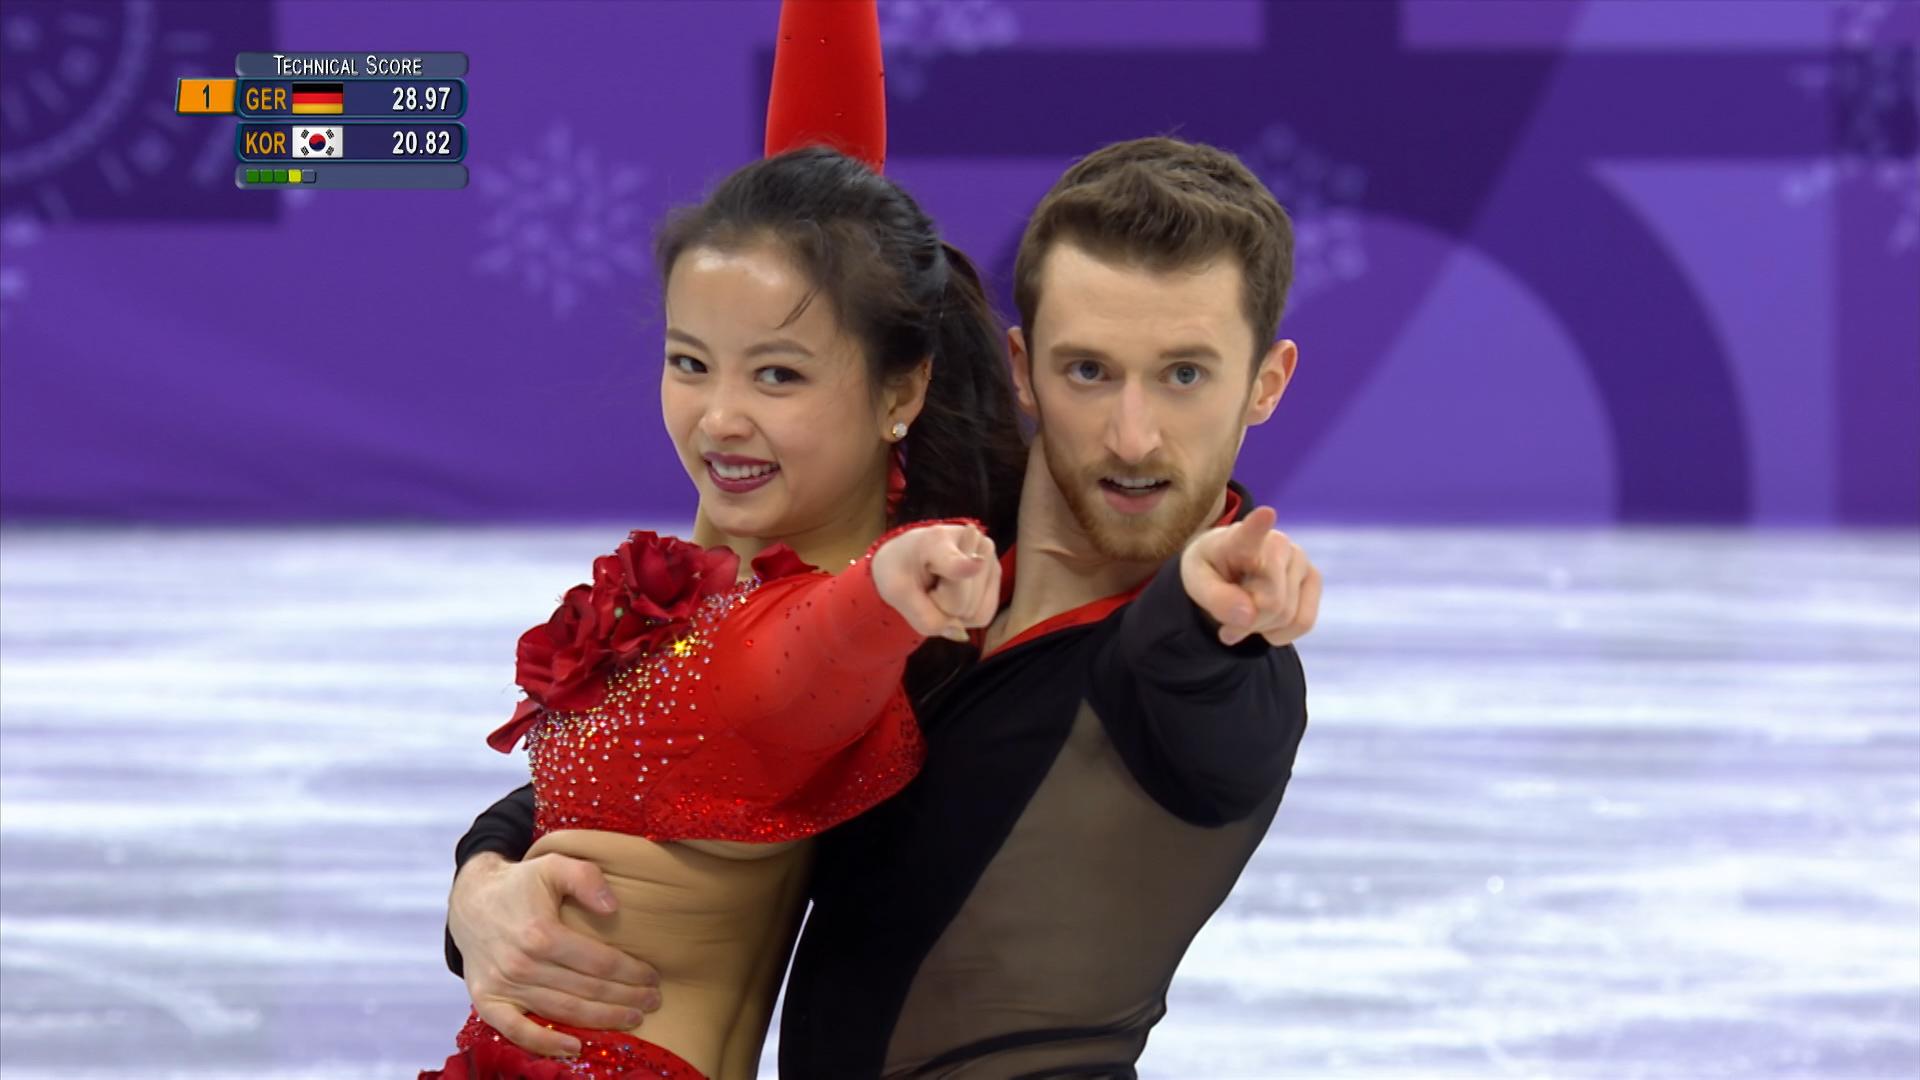 Winter Olympics 2018 Wardrobe Malfunction For South Korean Skater Yura Min